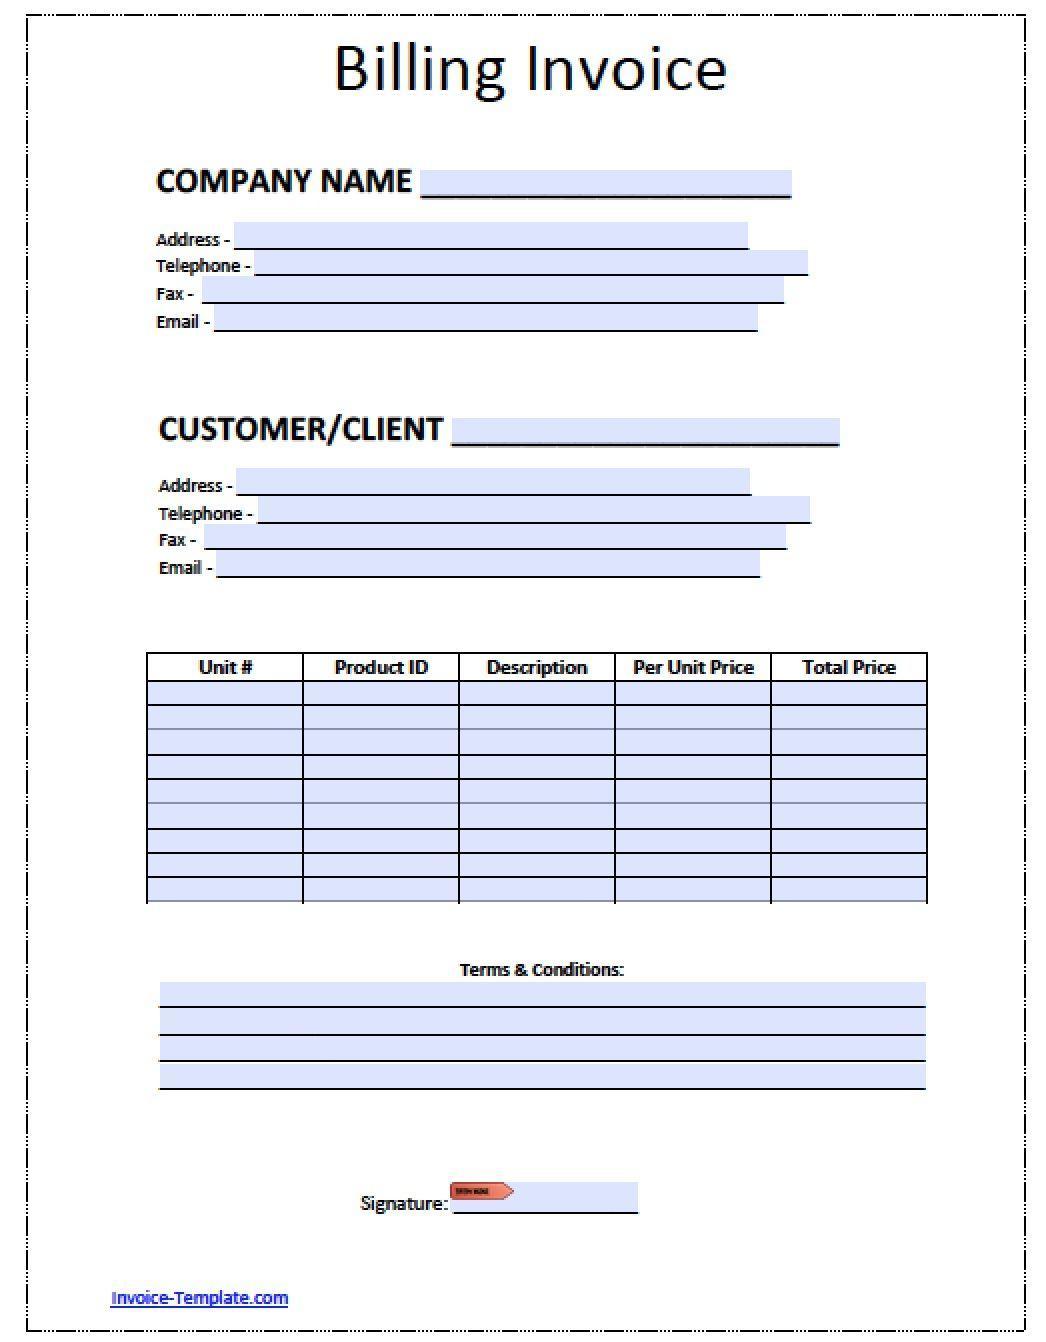 Billing Invoice Format